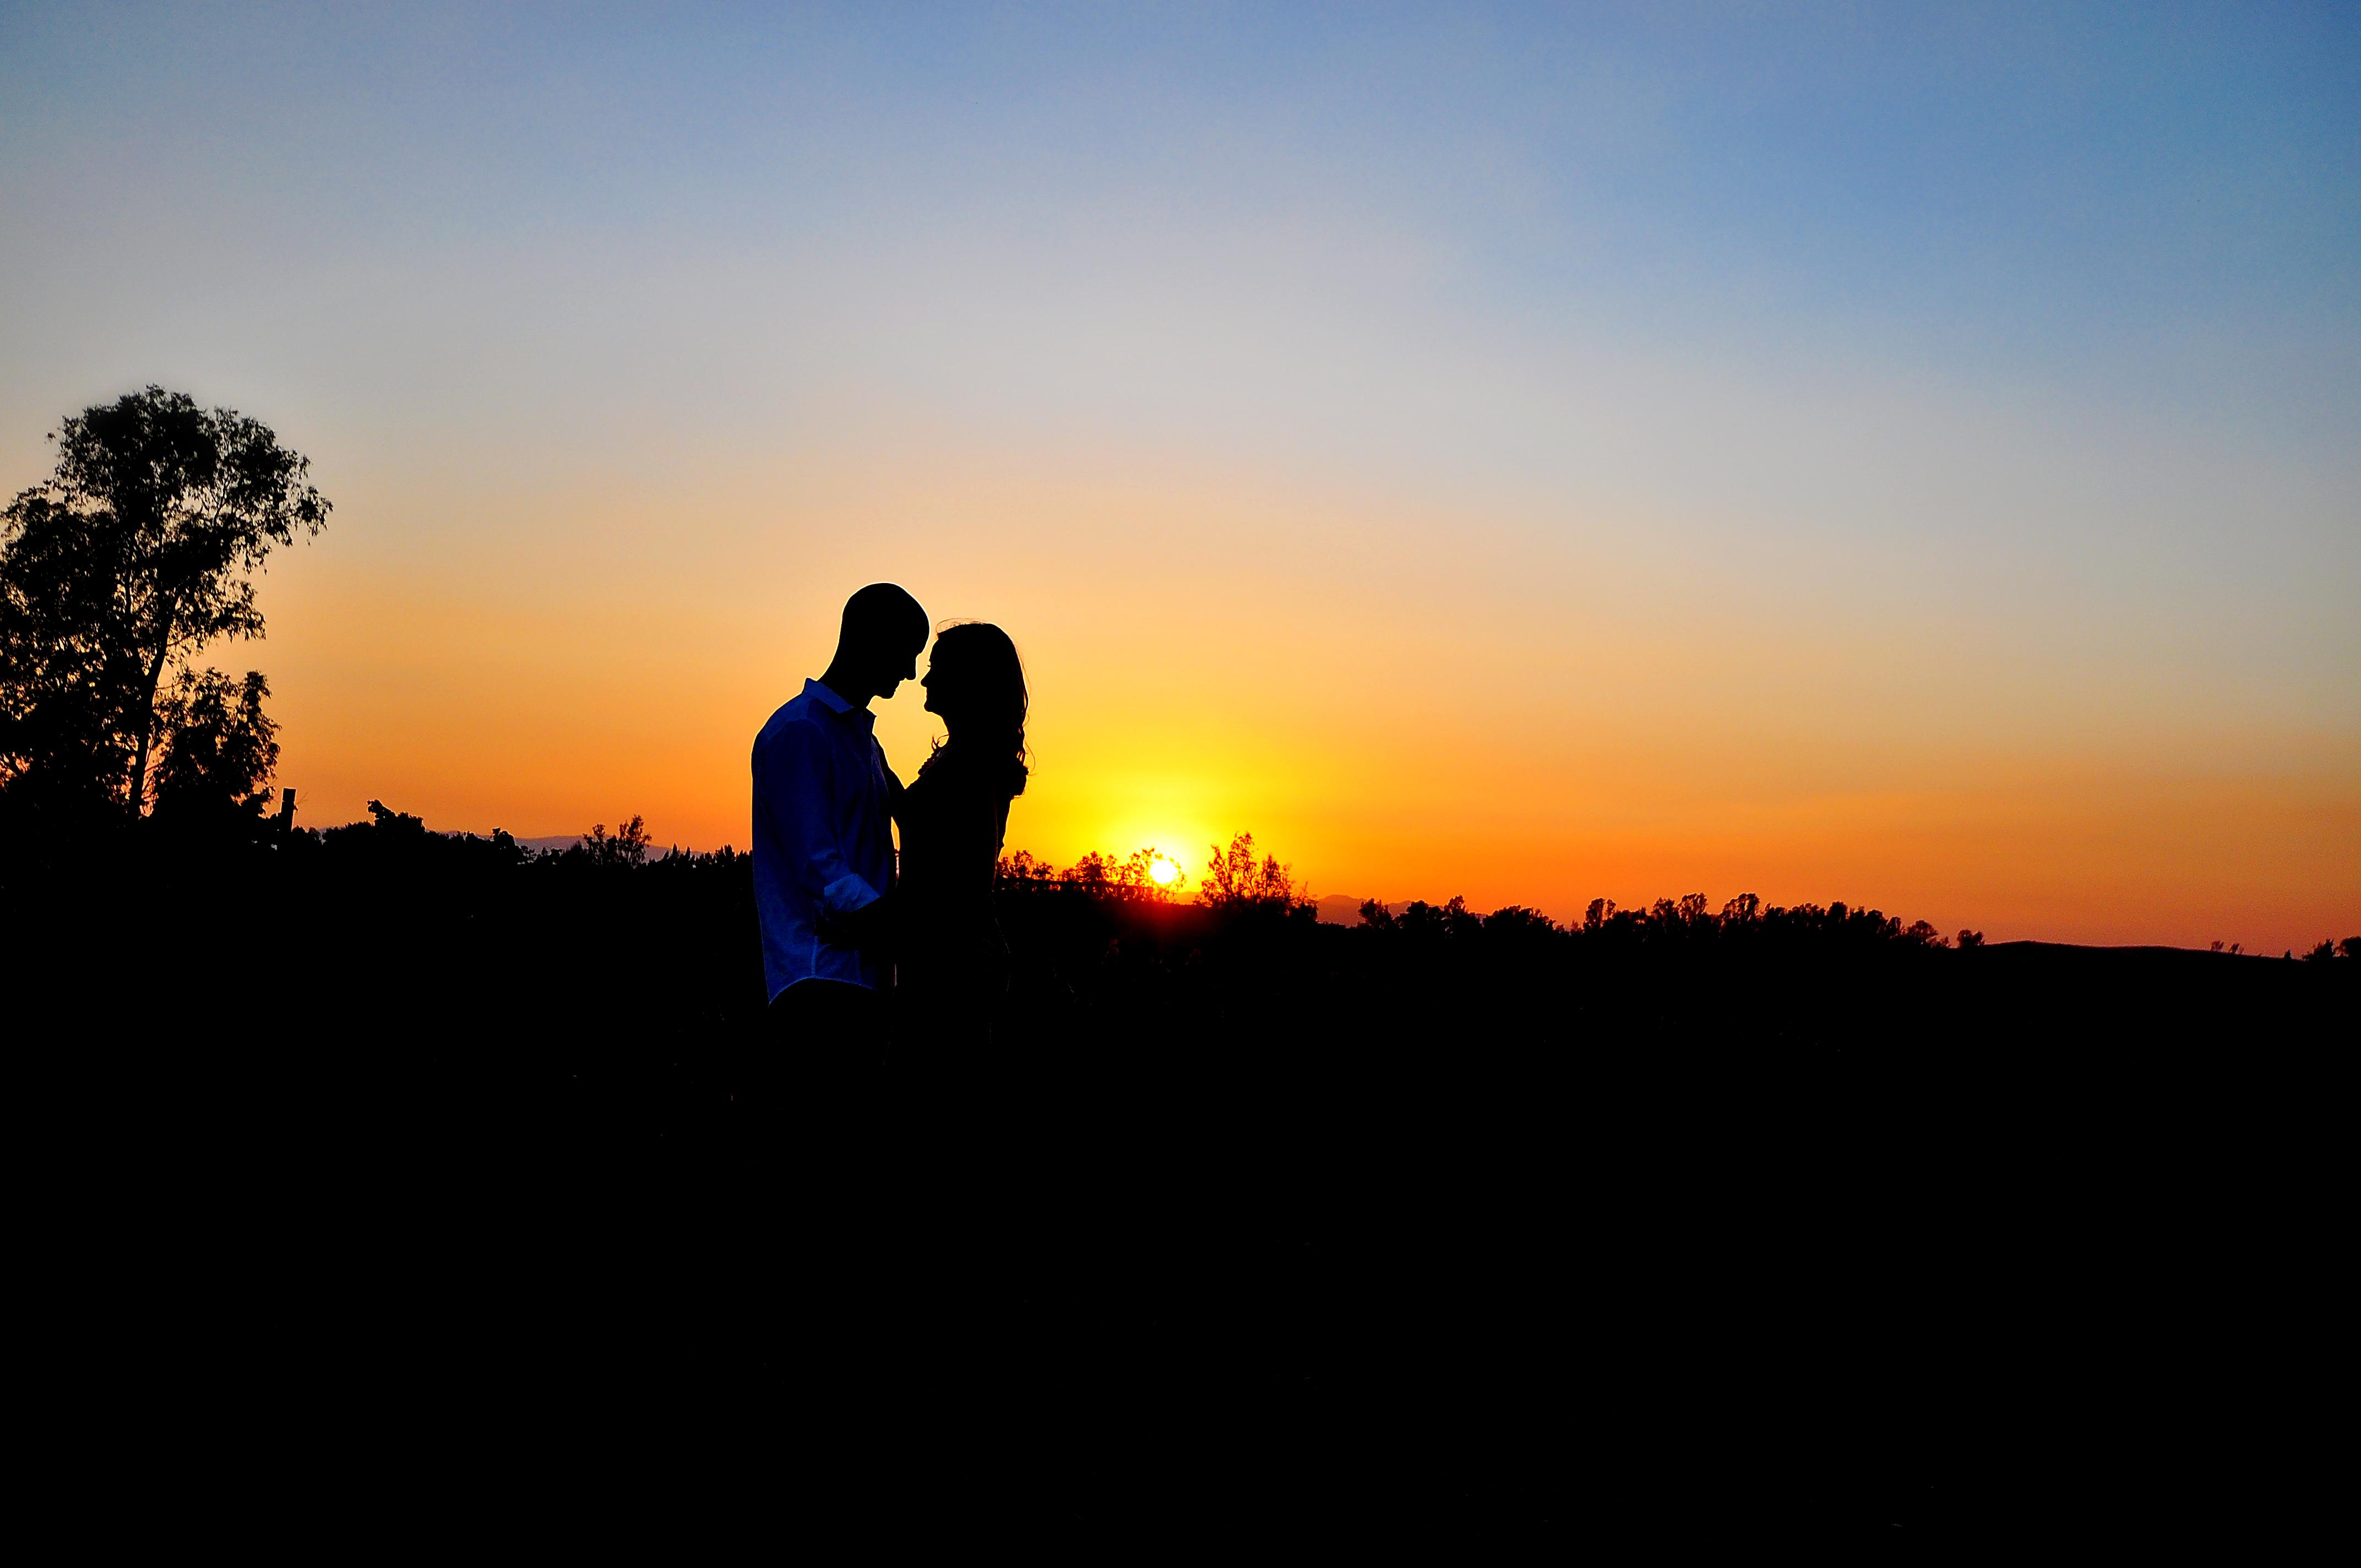 la joll engagement, san diego engagement, couple's portraits. la joll asunset, engagement portraits, sunset